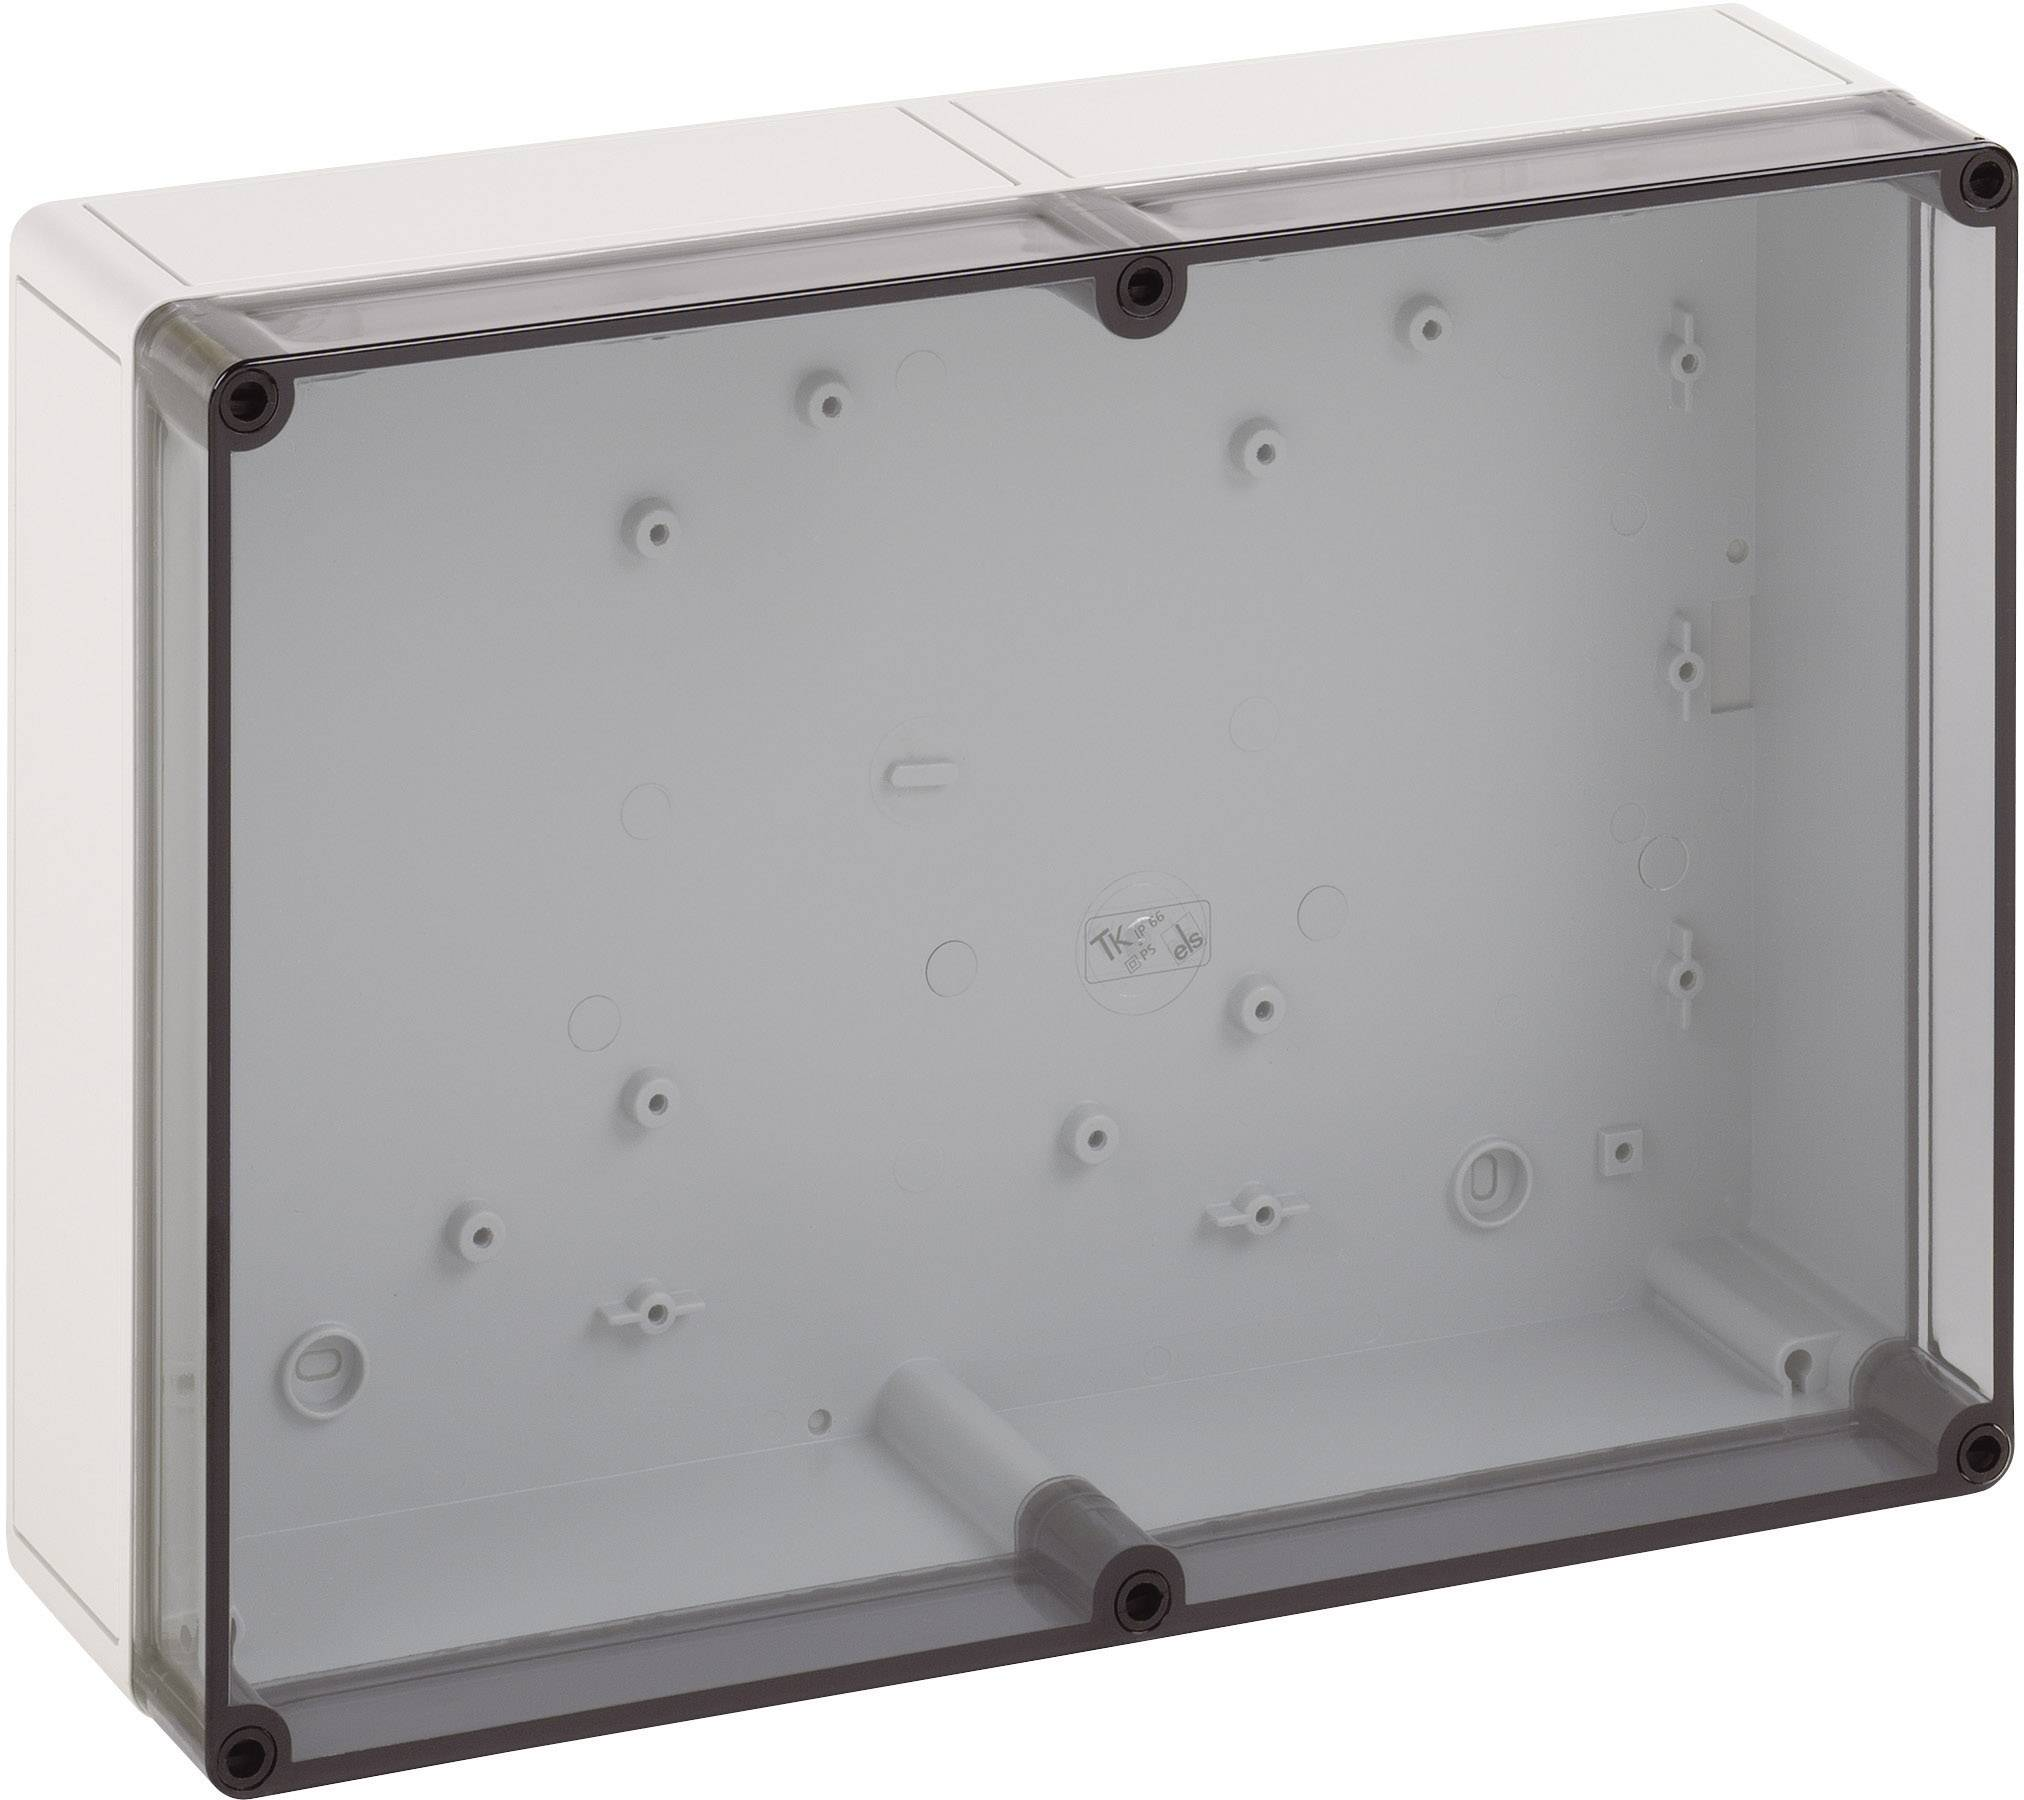 Instalační krabička Spelsberg TK PS 1309-8-t, (d x š x v) 130 x 94 x 81 mm, polykarbonát, polystyren, šedá, 1 ks